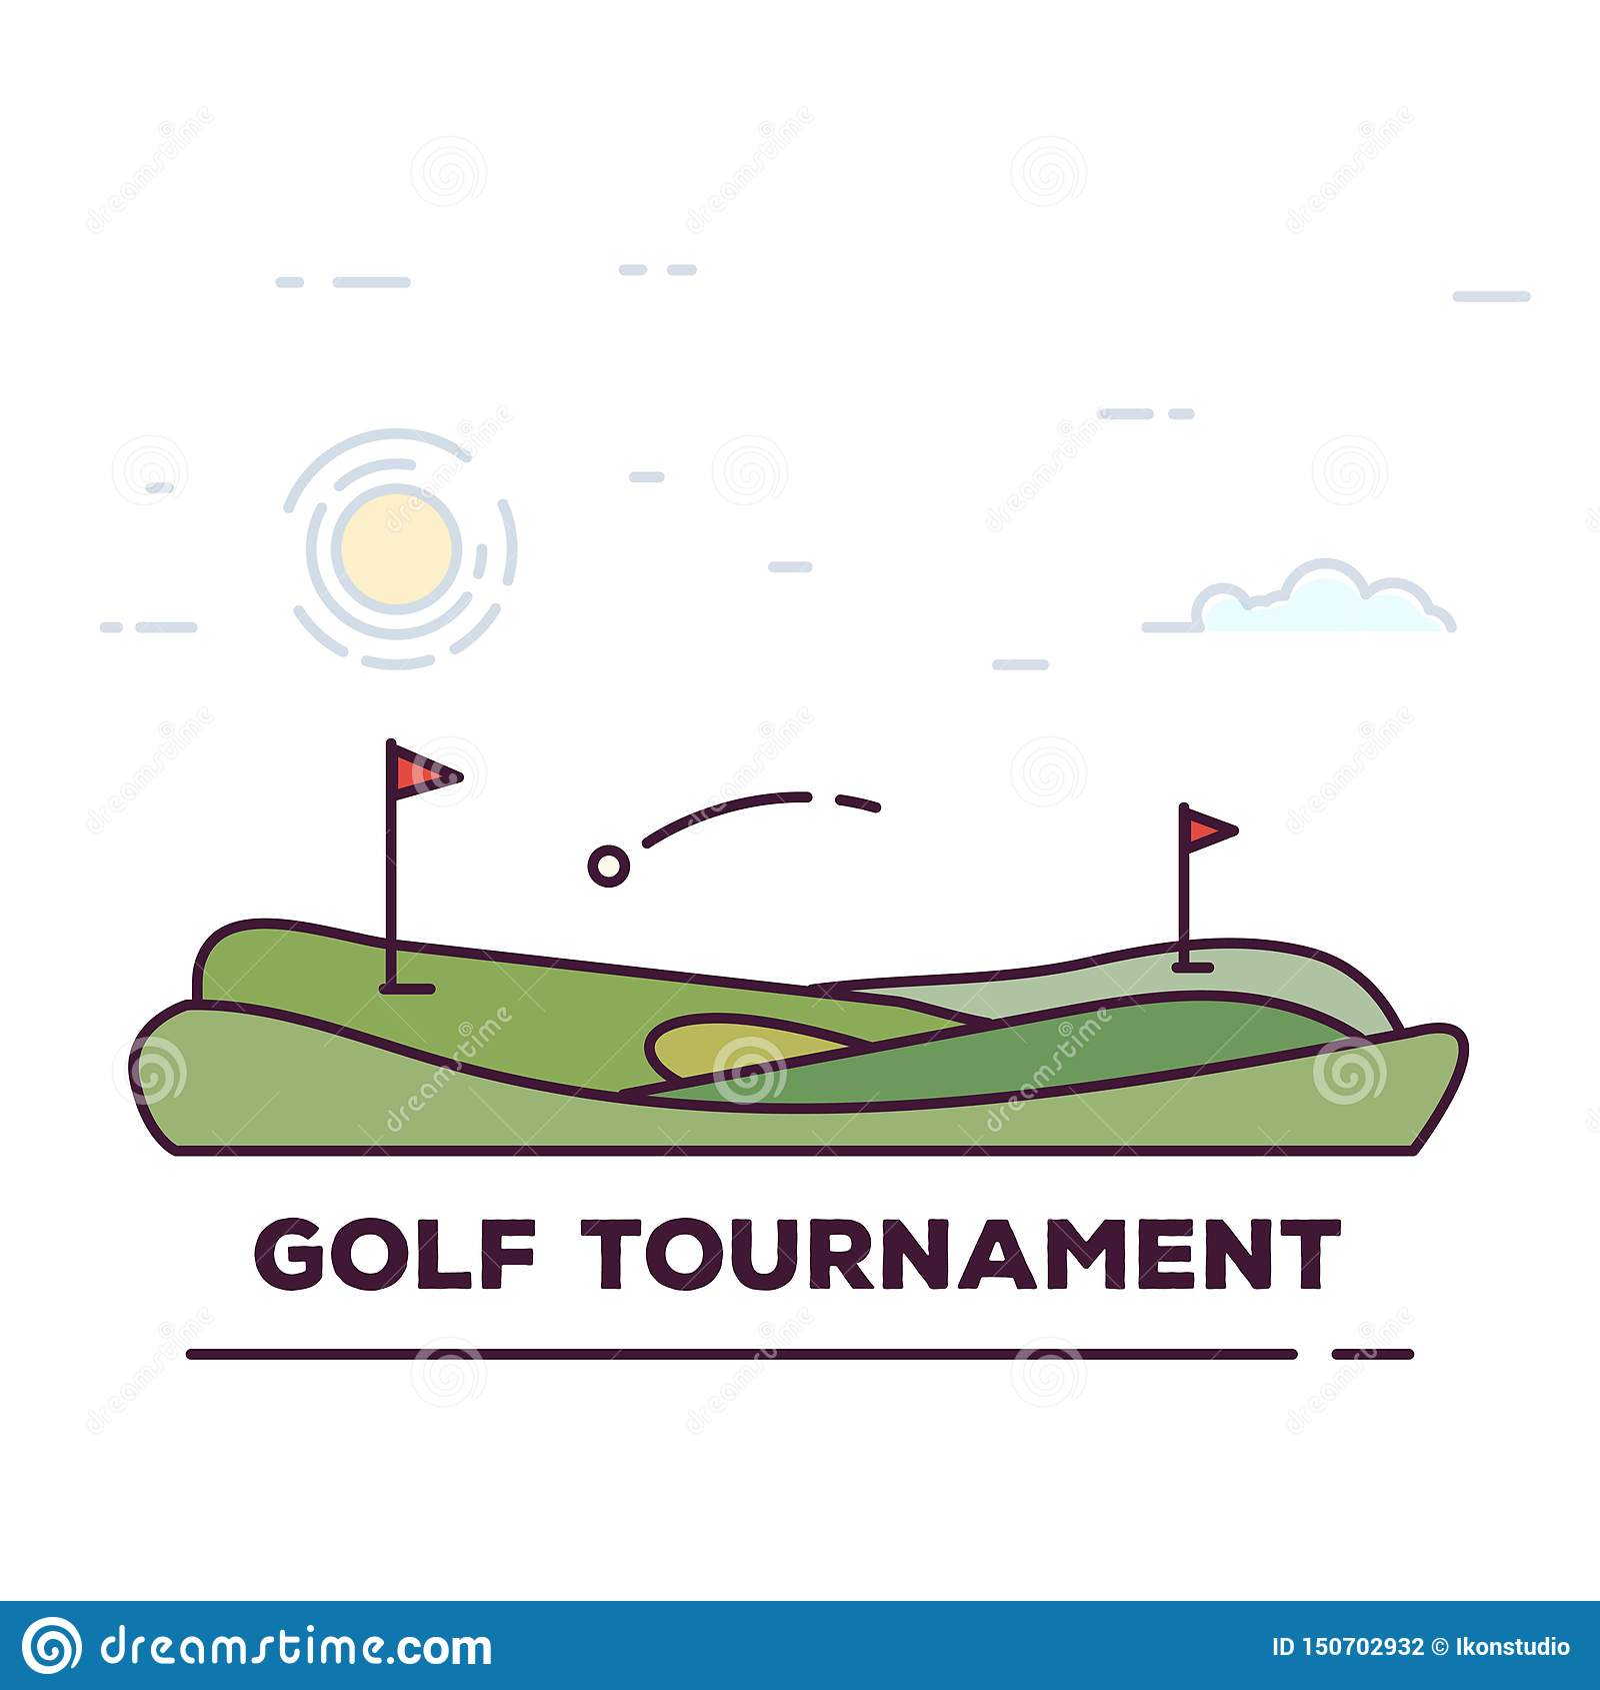 Golf tournament line banner